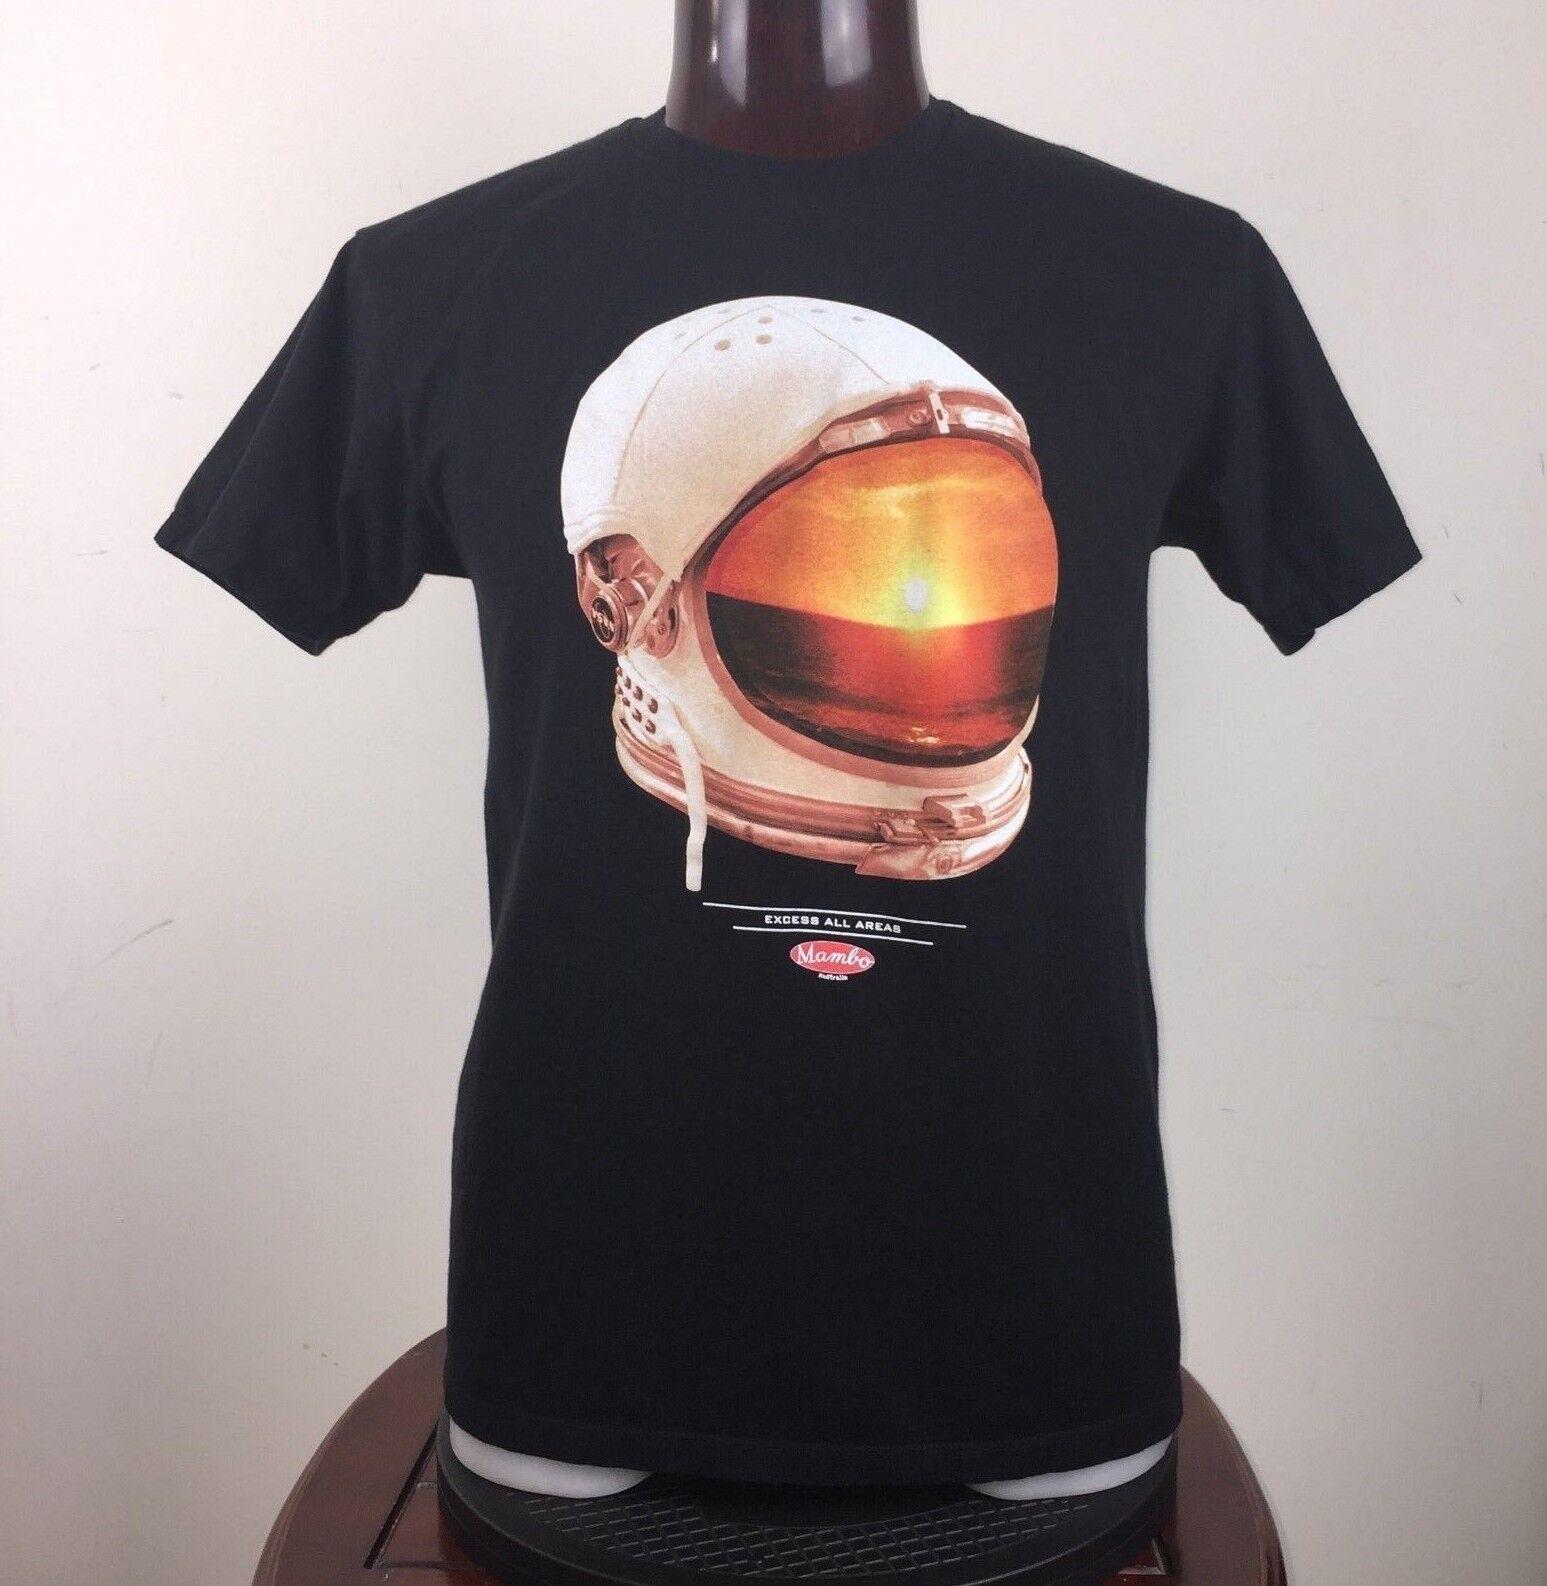 Mambo Mens L Helmet NASA Astronaut Excess All Areas T-Shirt Short Sleeve